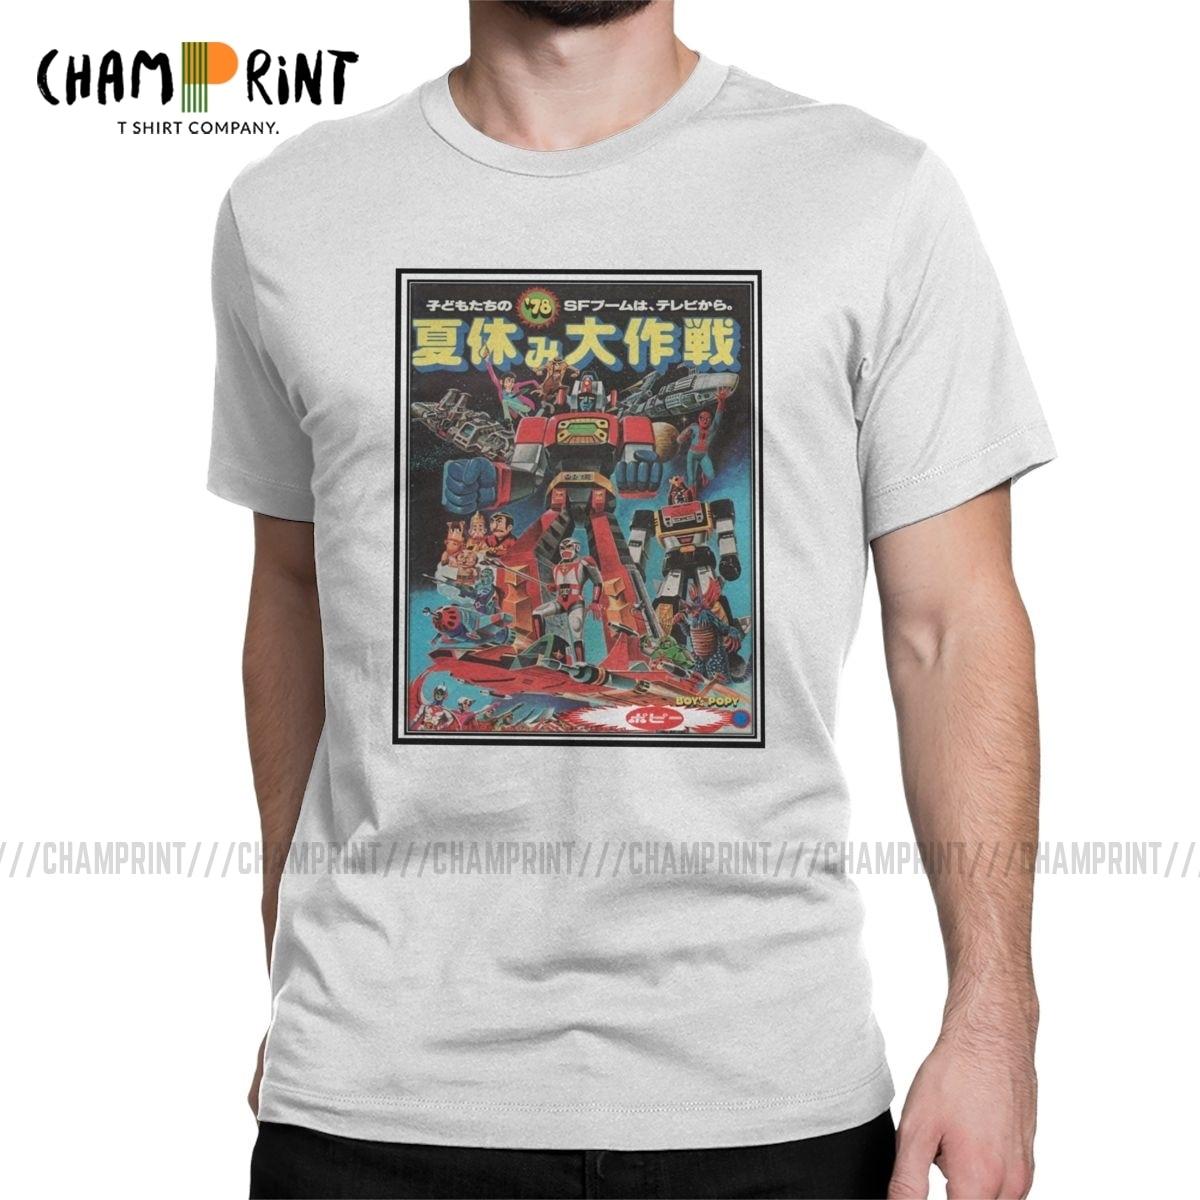 Popy 1978 Men's T Shirts Ultraman Japanese Anime Rider Hero Robot Kaiju Funny Tees Crew Neck T-Shirt 100% Cotton Gift Idea Tops